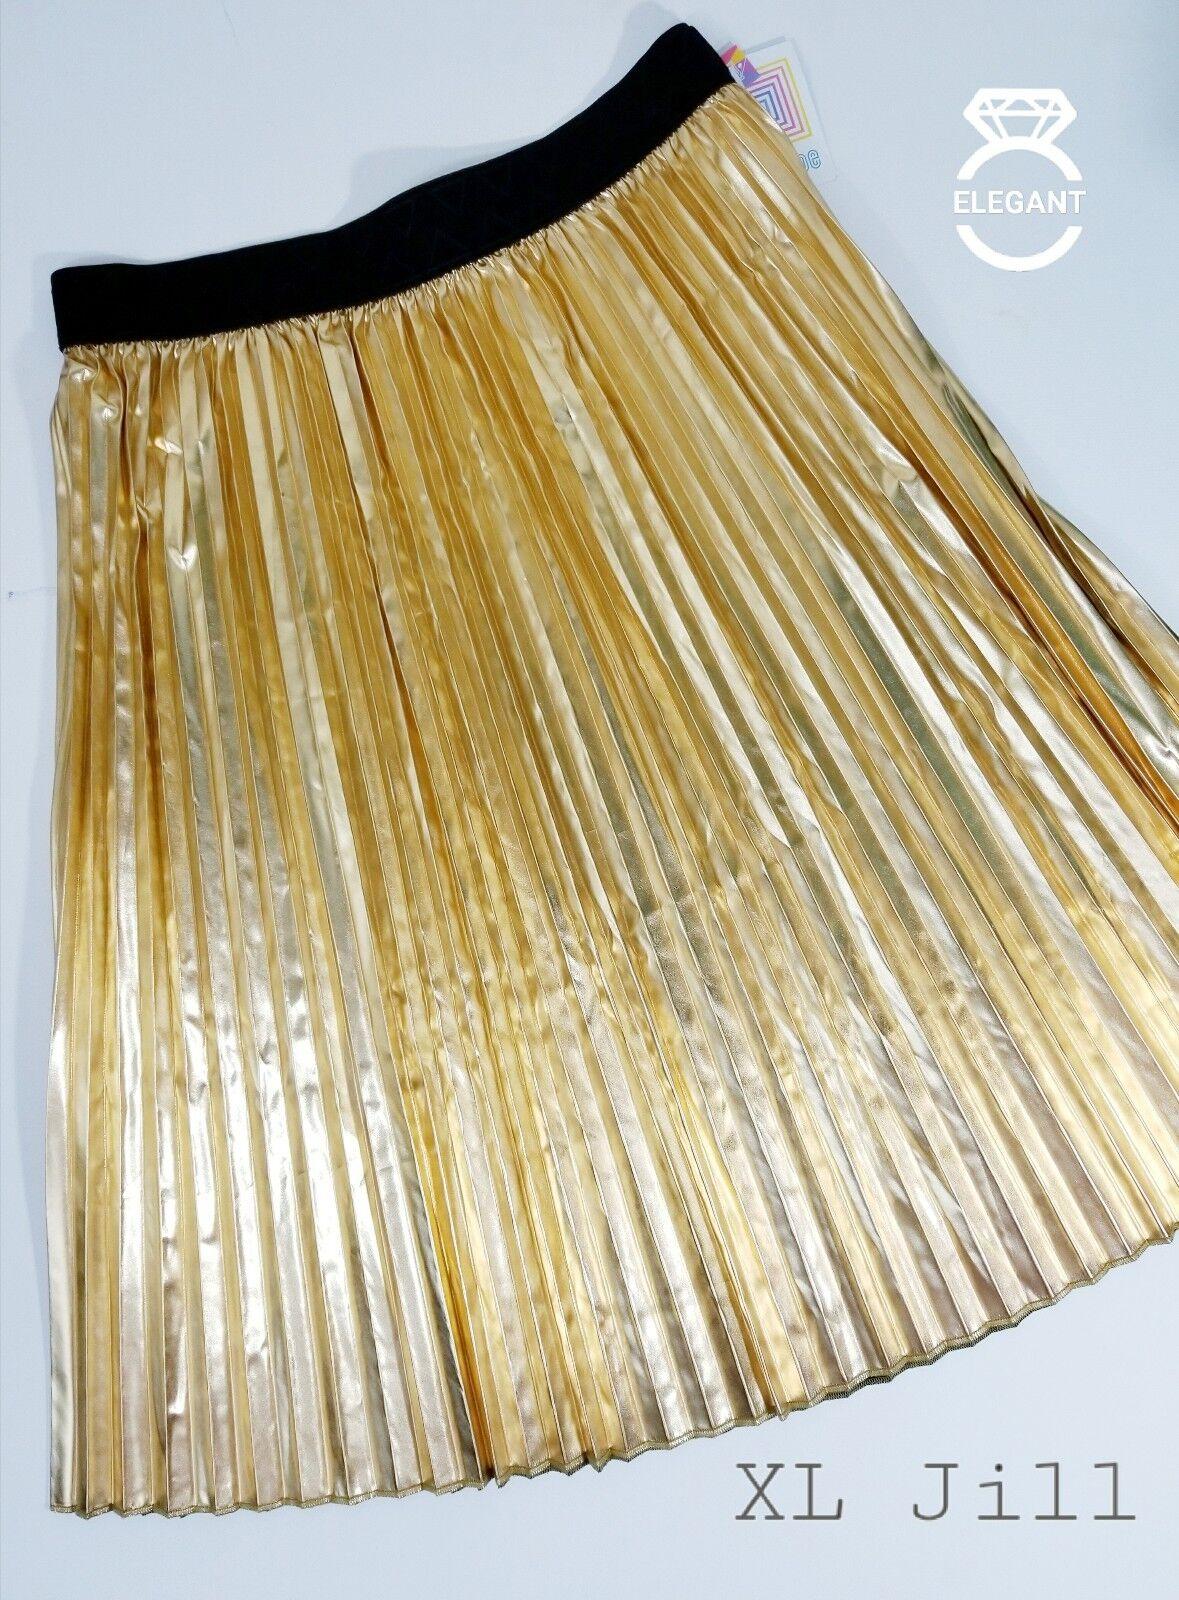 LuLaRoe Elegant gold Jill, XL